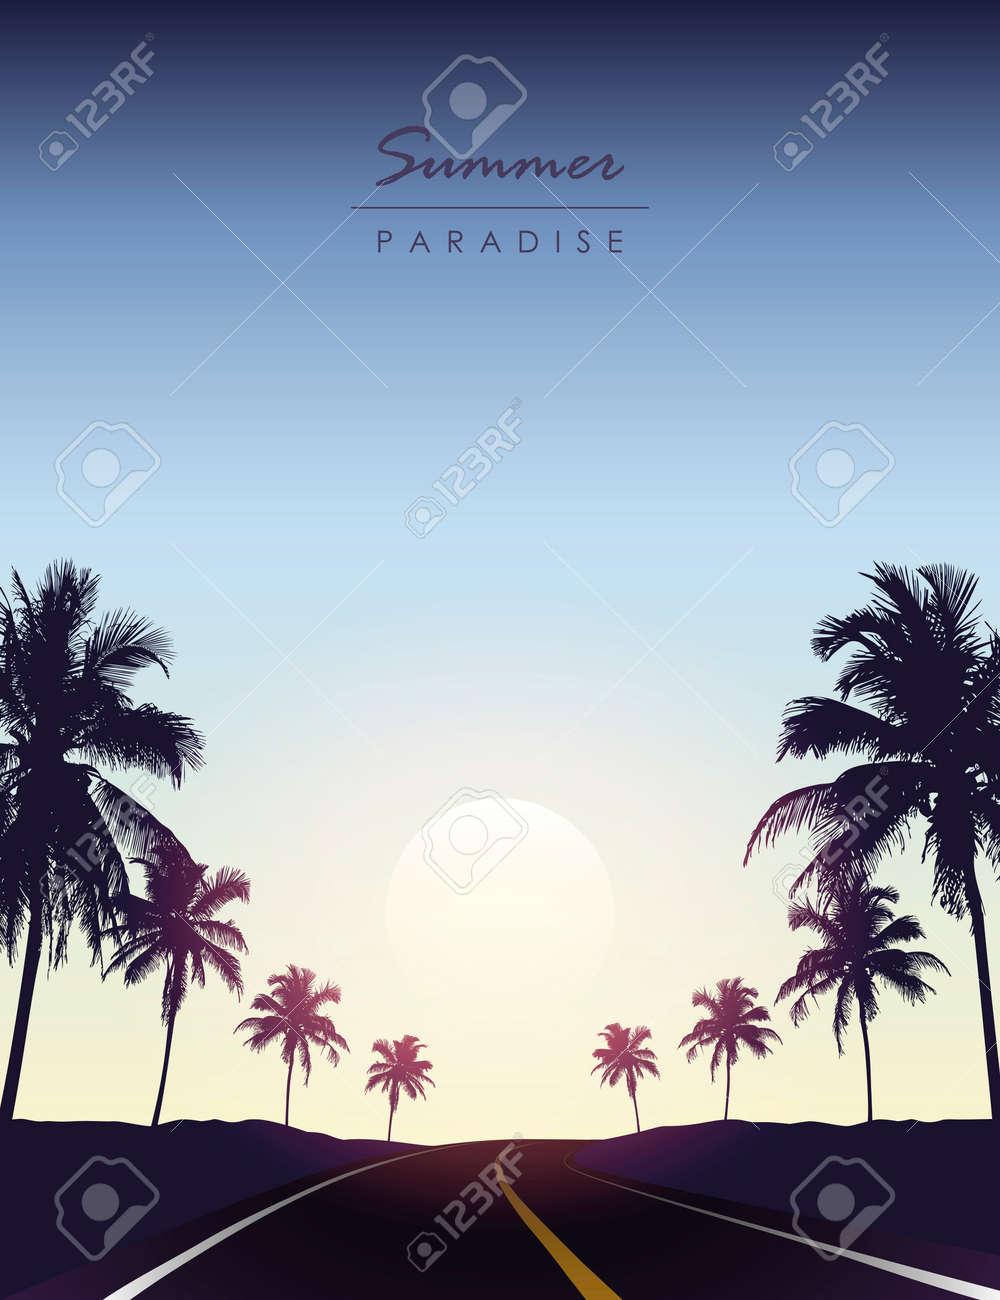 summer paradise road trip beautiful sunset tropical palm - 169841402